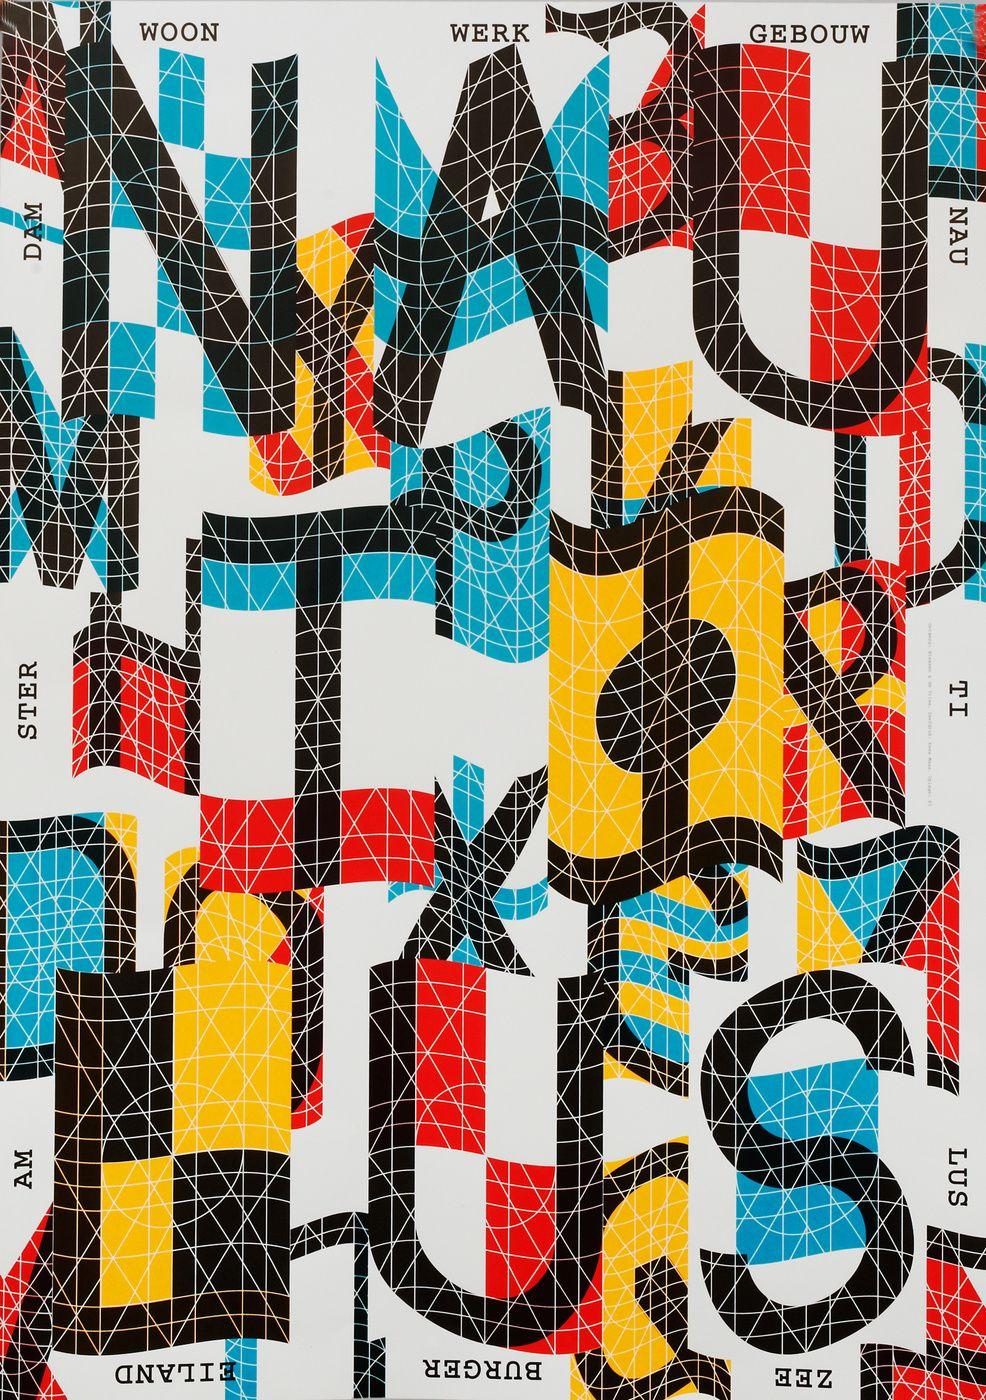 Niessen De Vries Graphic Poster Graphic Design Typography Typography Poster